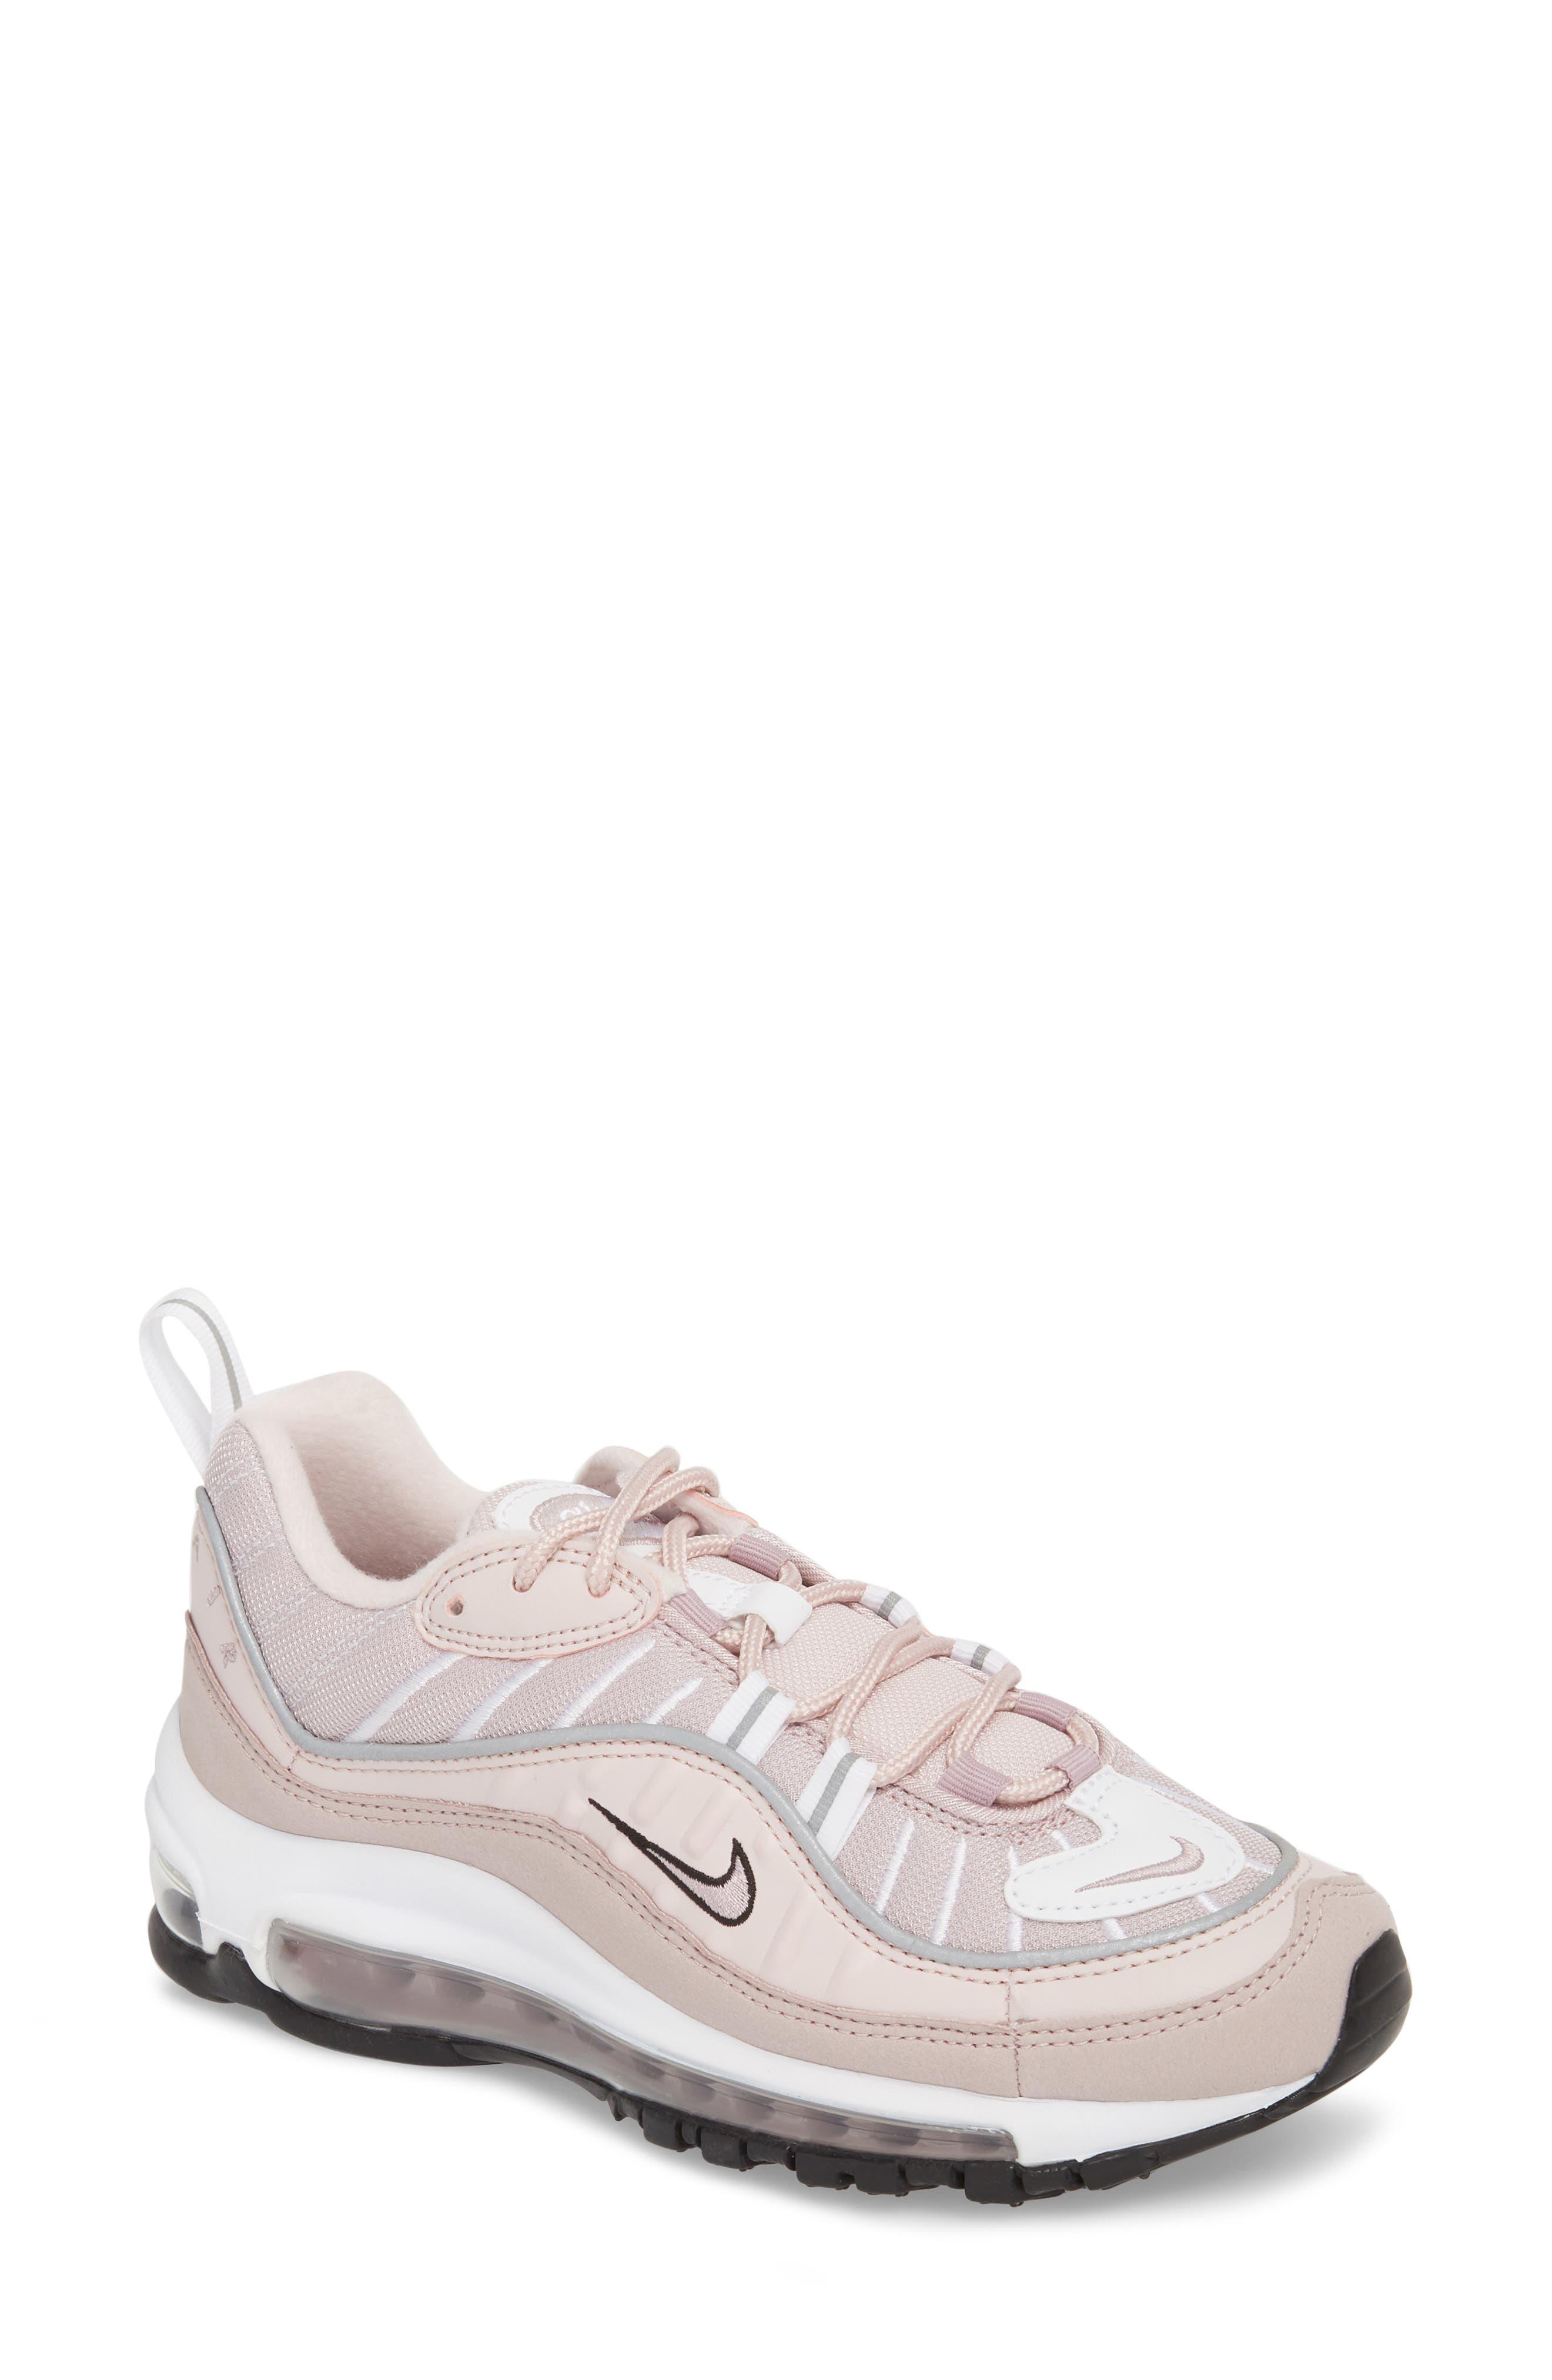 quality design f6516 0ad00 ... coupon code nike air max 98 running shoe women 826b9 1d079